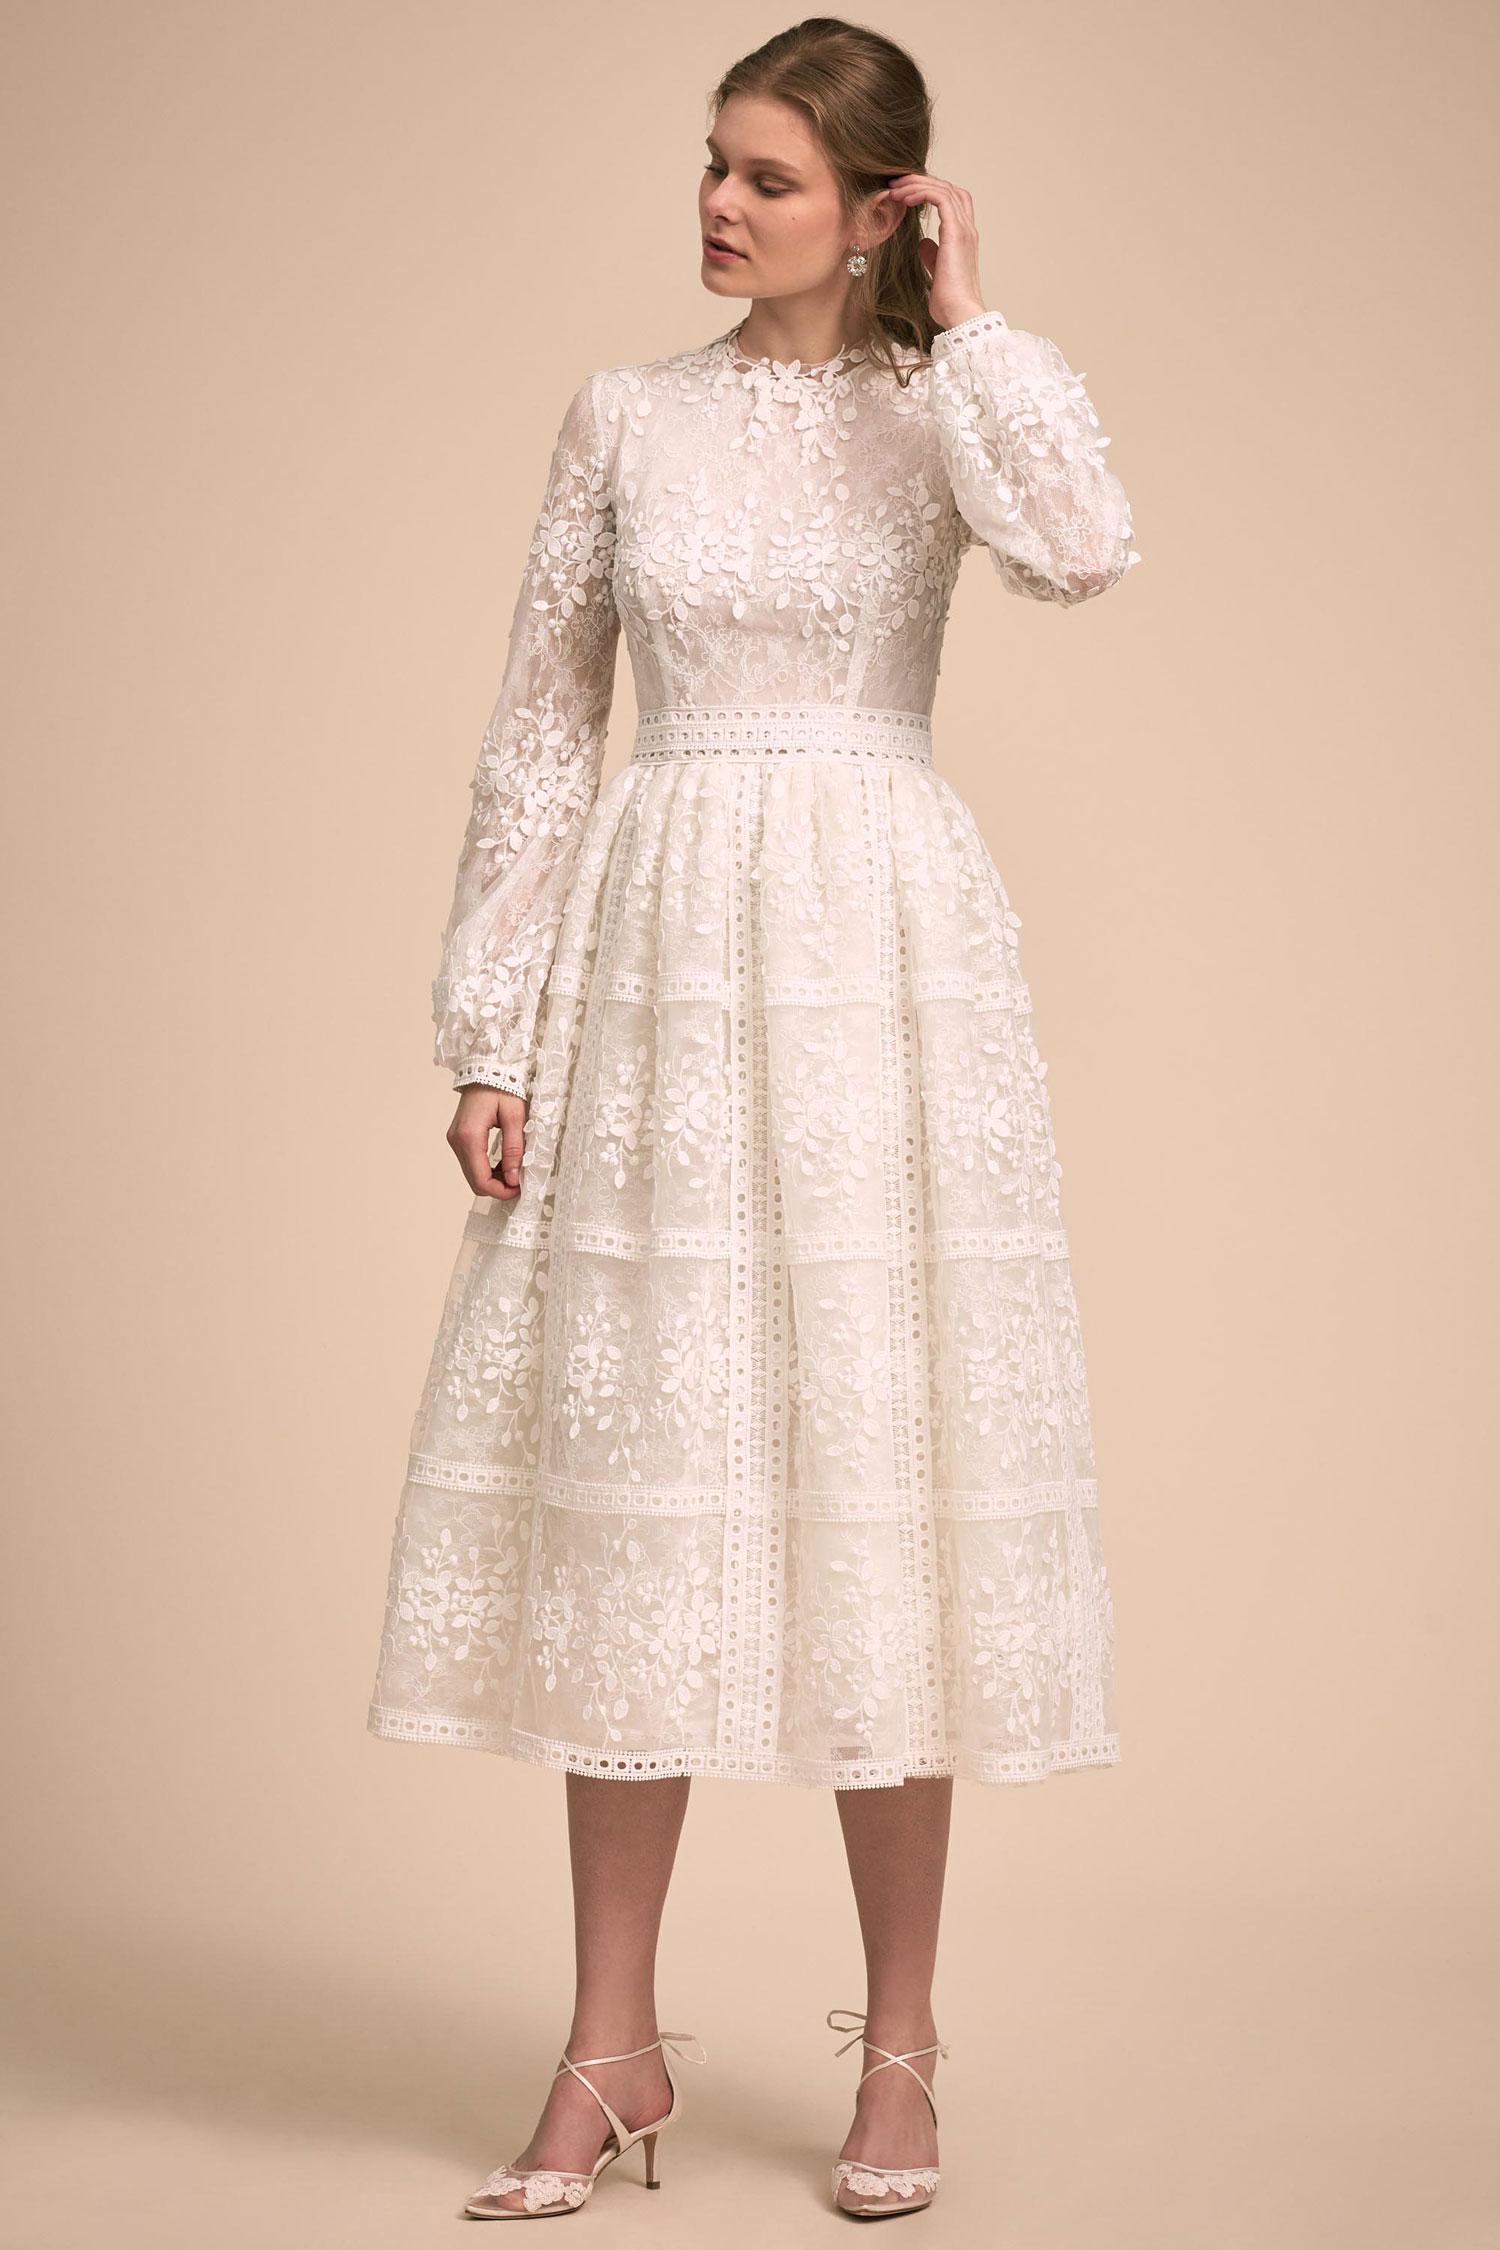 BHLDN The Designer Collective Shaw by Costarellos long sleeve tea length wedding dress